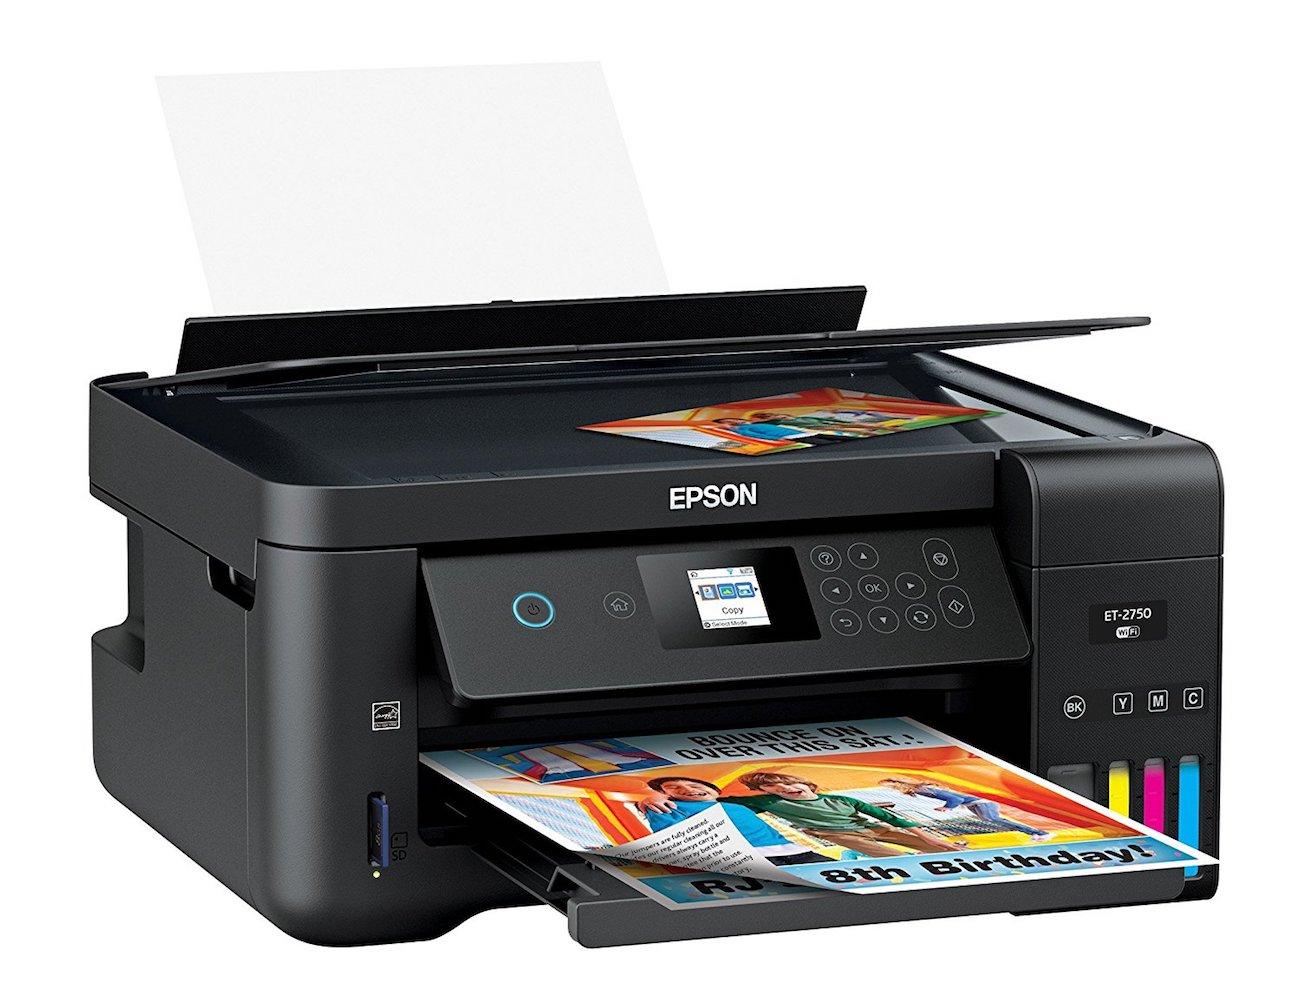 Expression ET-2750 EcoTank All-in-One Supertank Printer